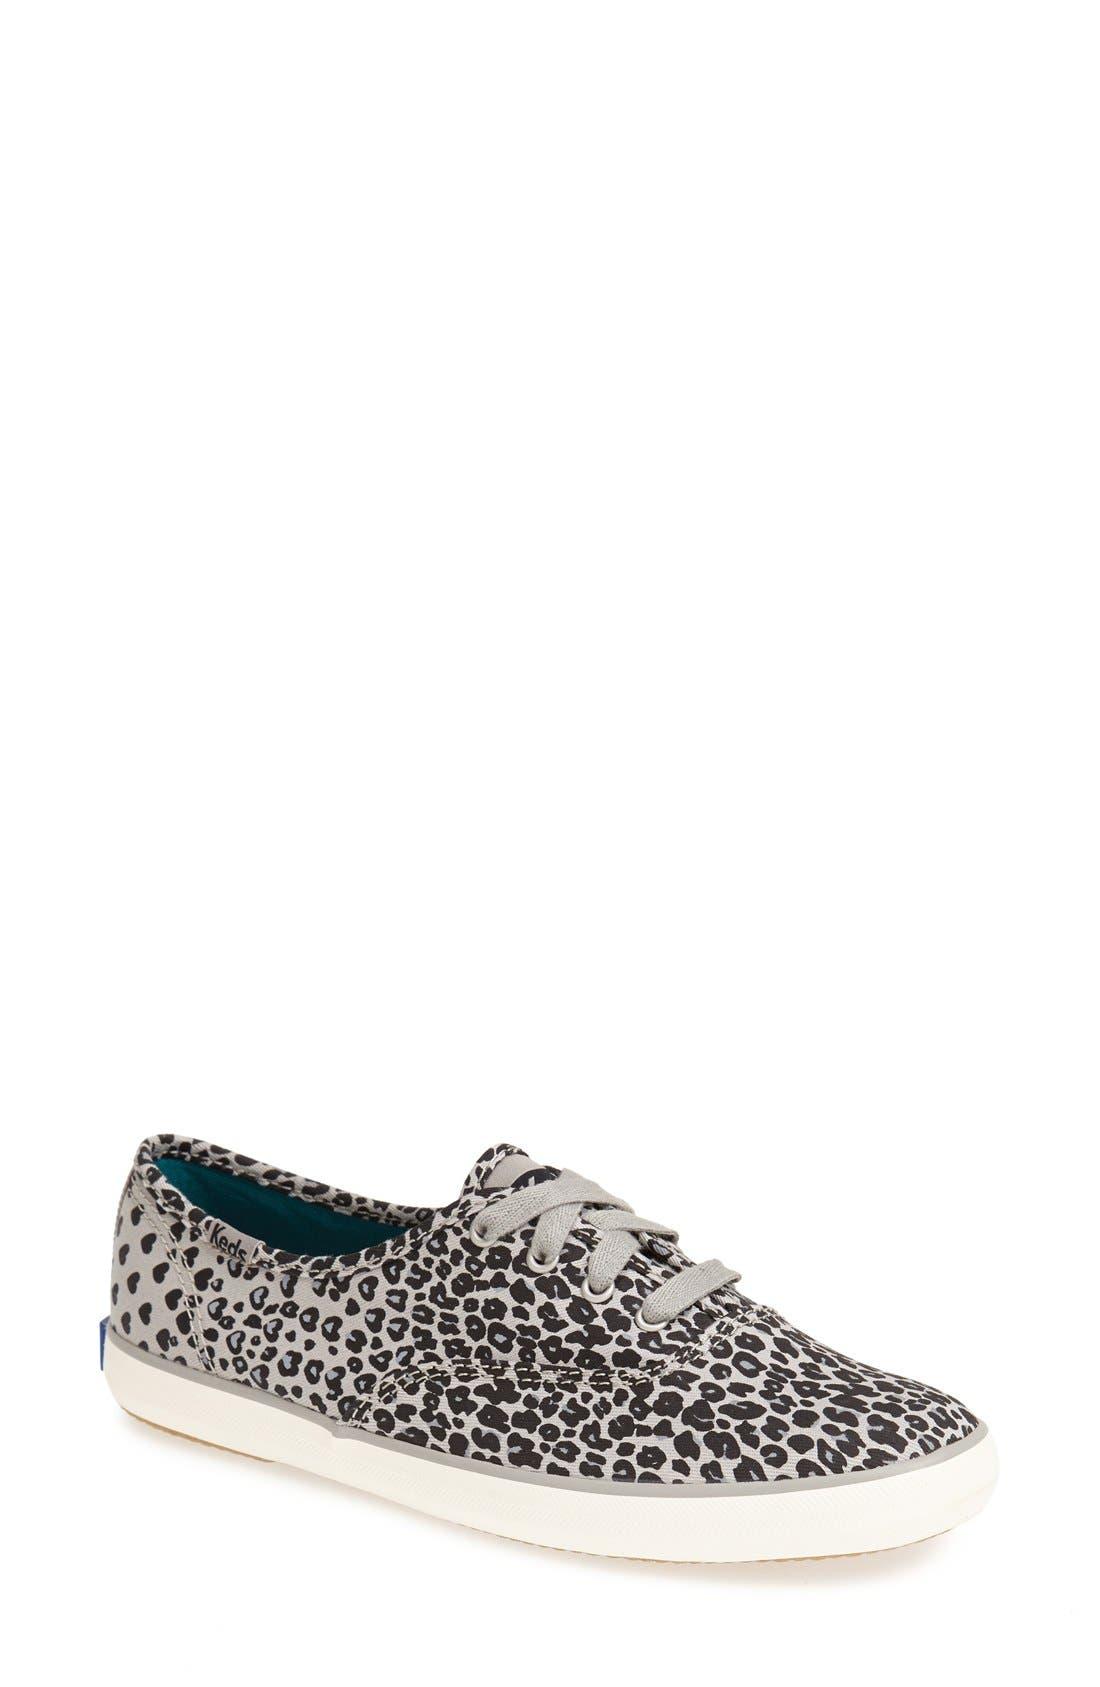 Alternate Image 1 Selected - Keds® 'Champion - Leopard' Sneaker (Women)